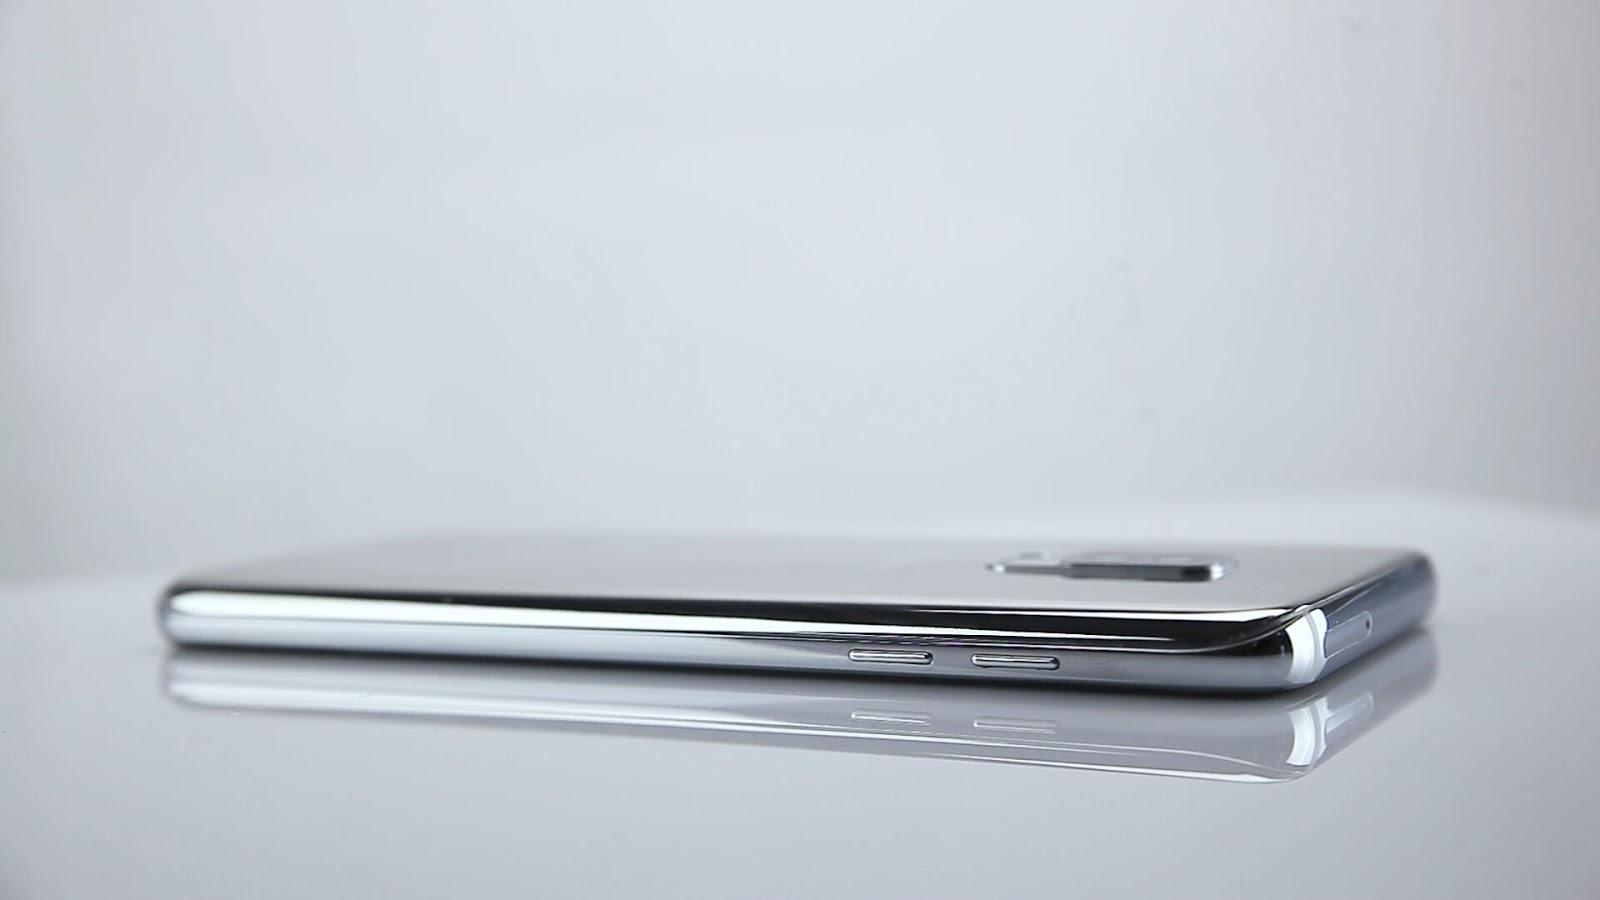 Официальное видео распаковки безрамочного смартфона Bluboo S8+